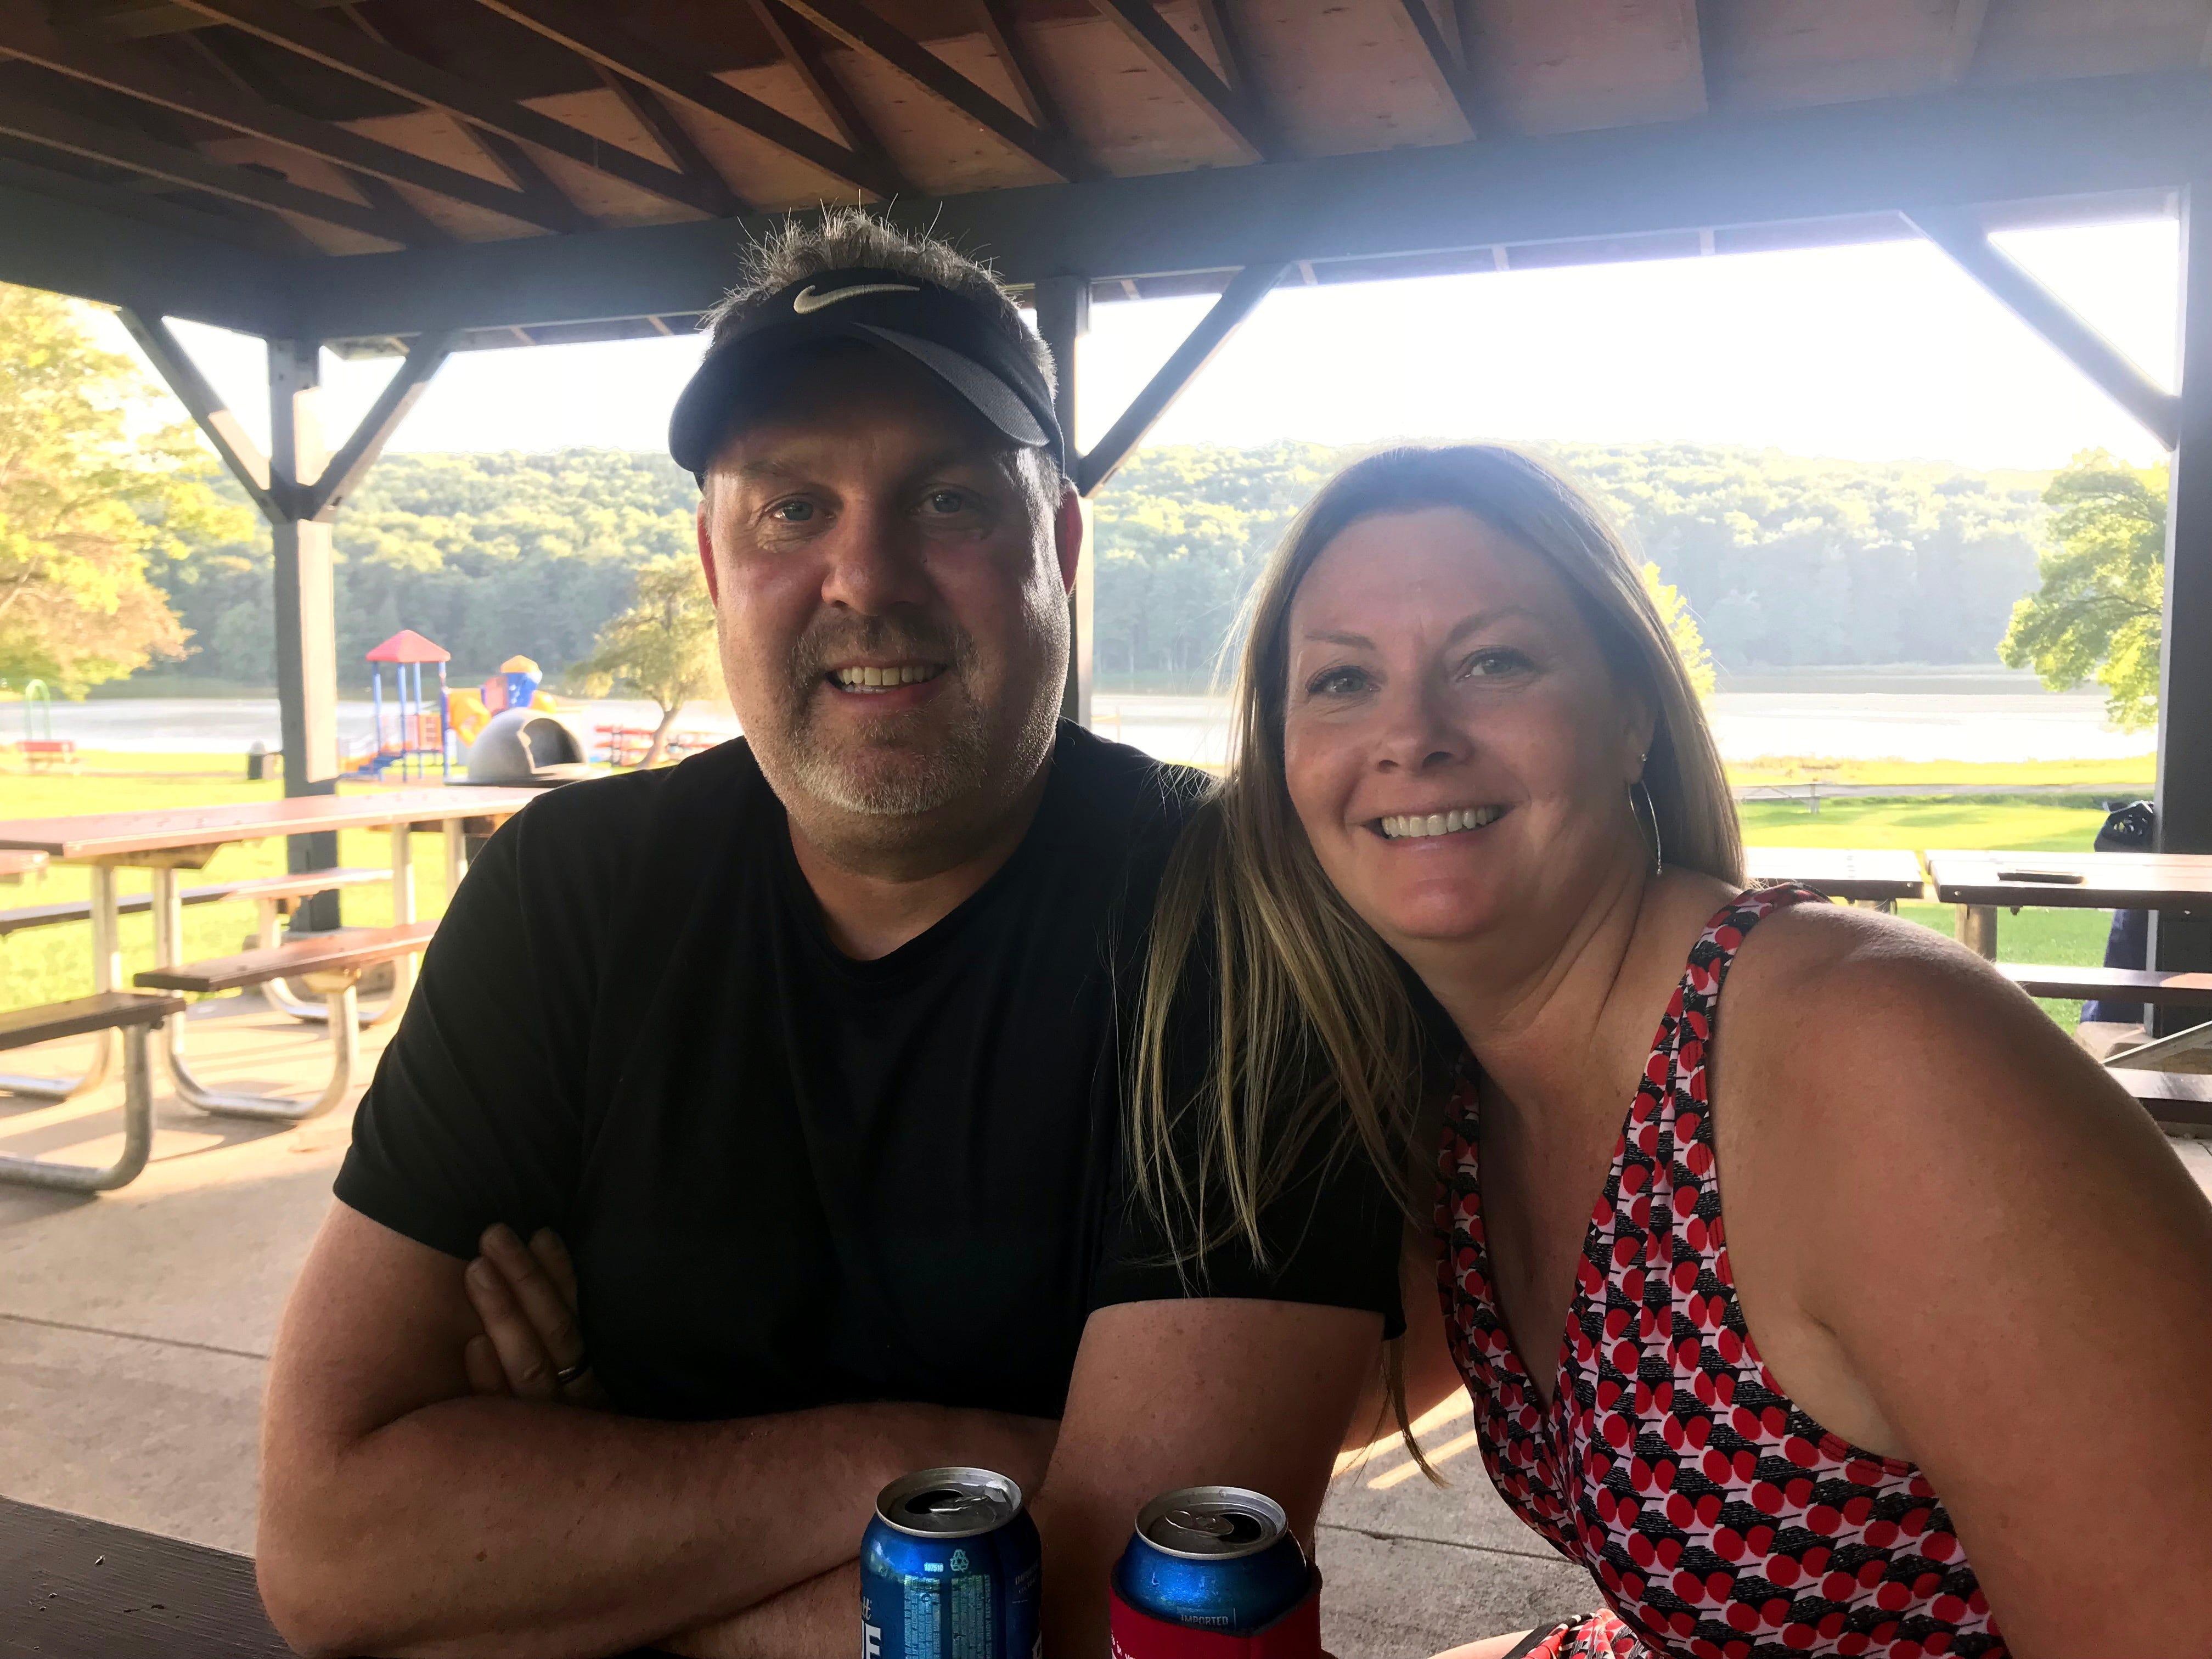 Scott Jackowski and his sister, Lori Hoban.